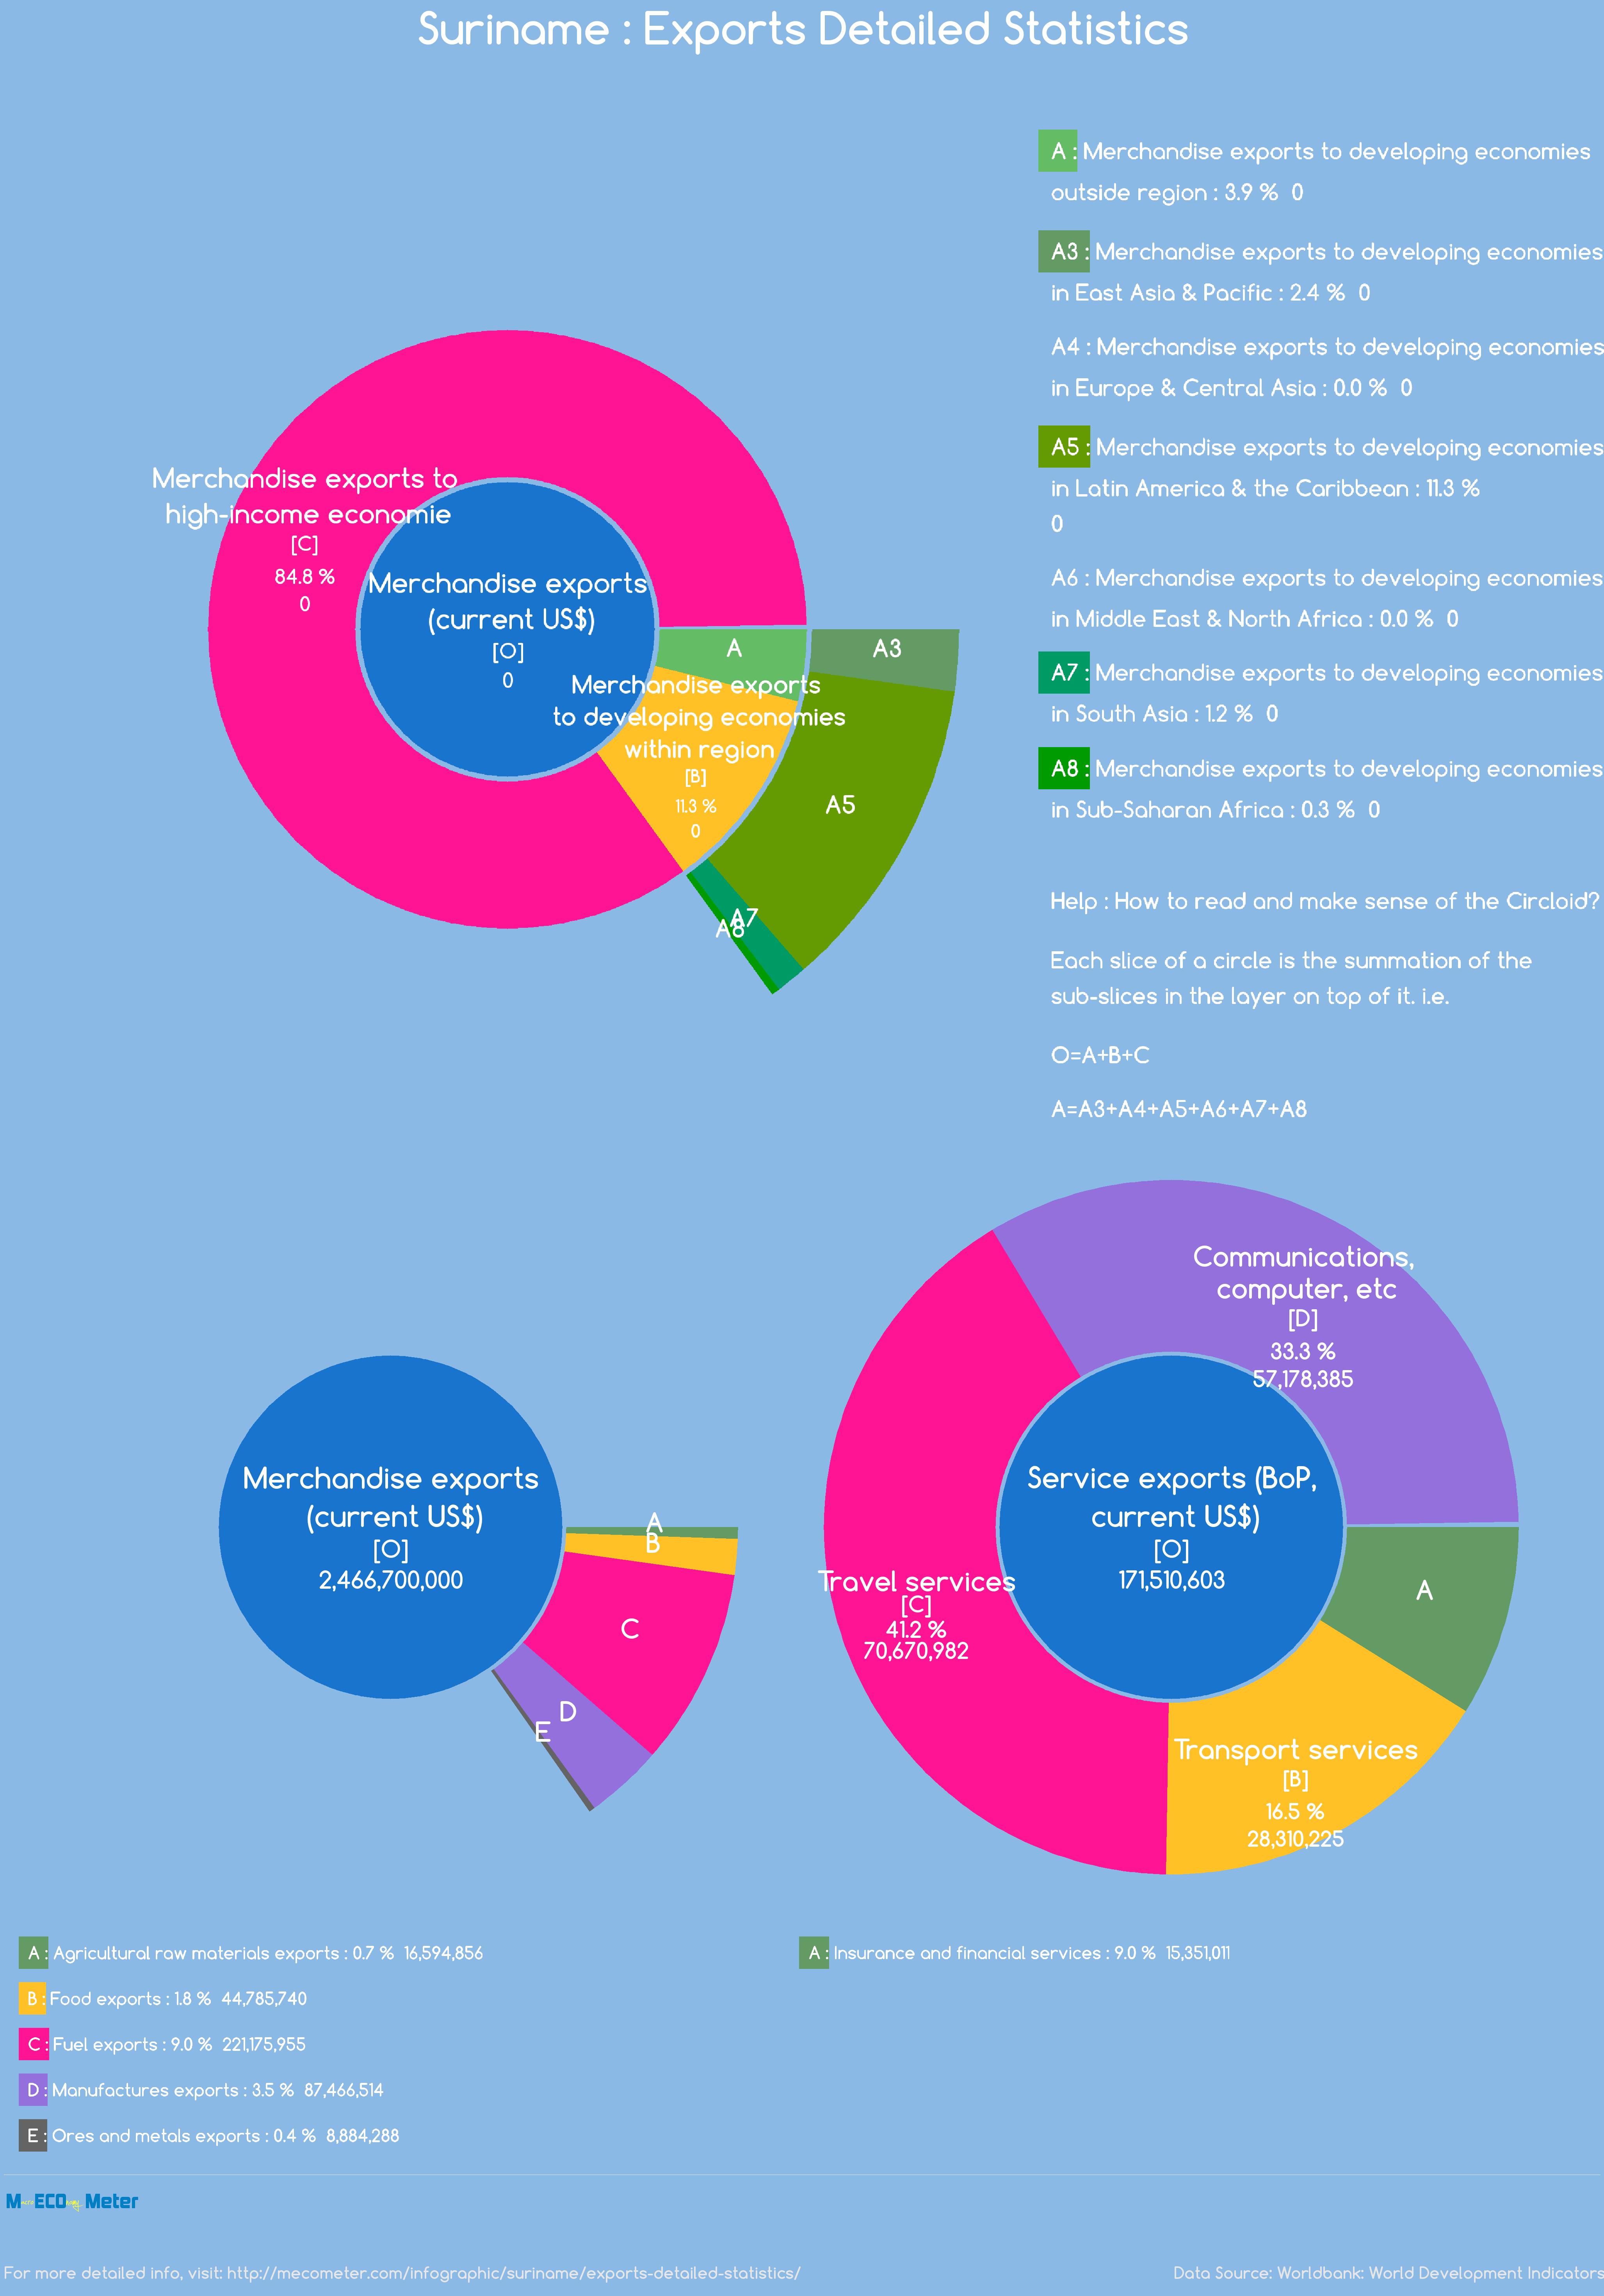 Suriname : Exports Detailed Statistics